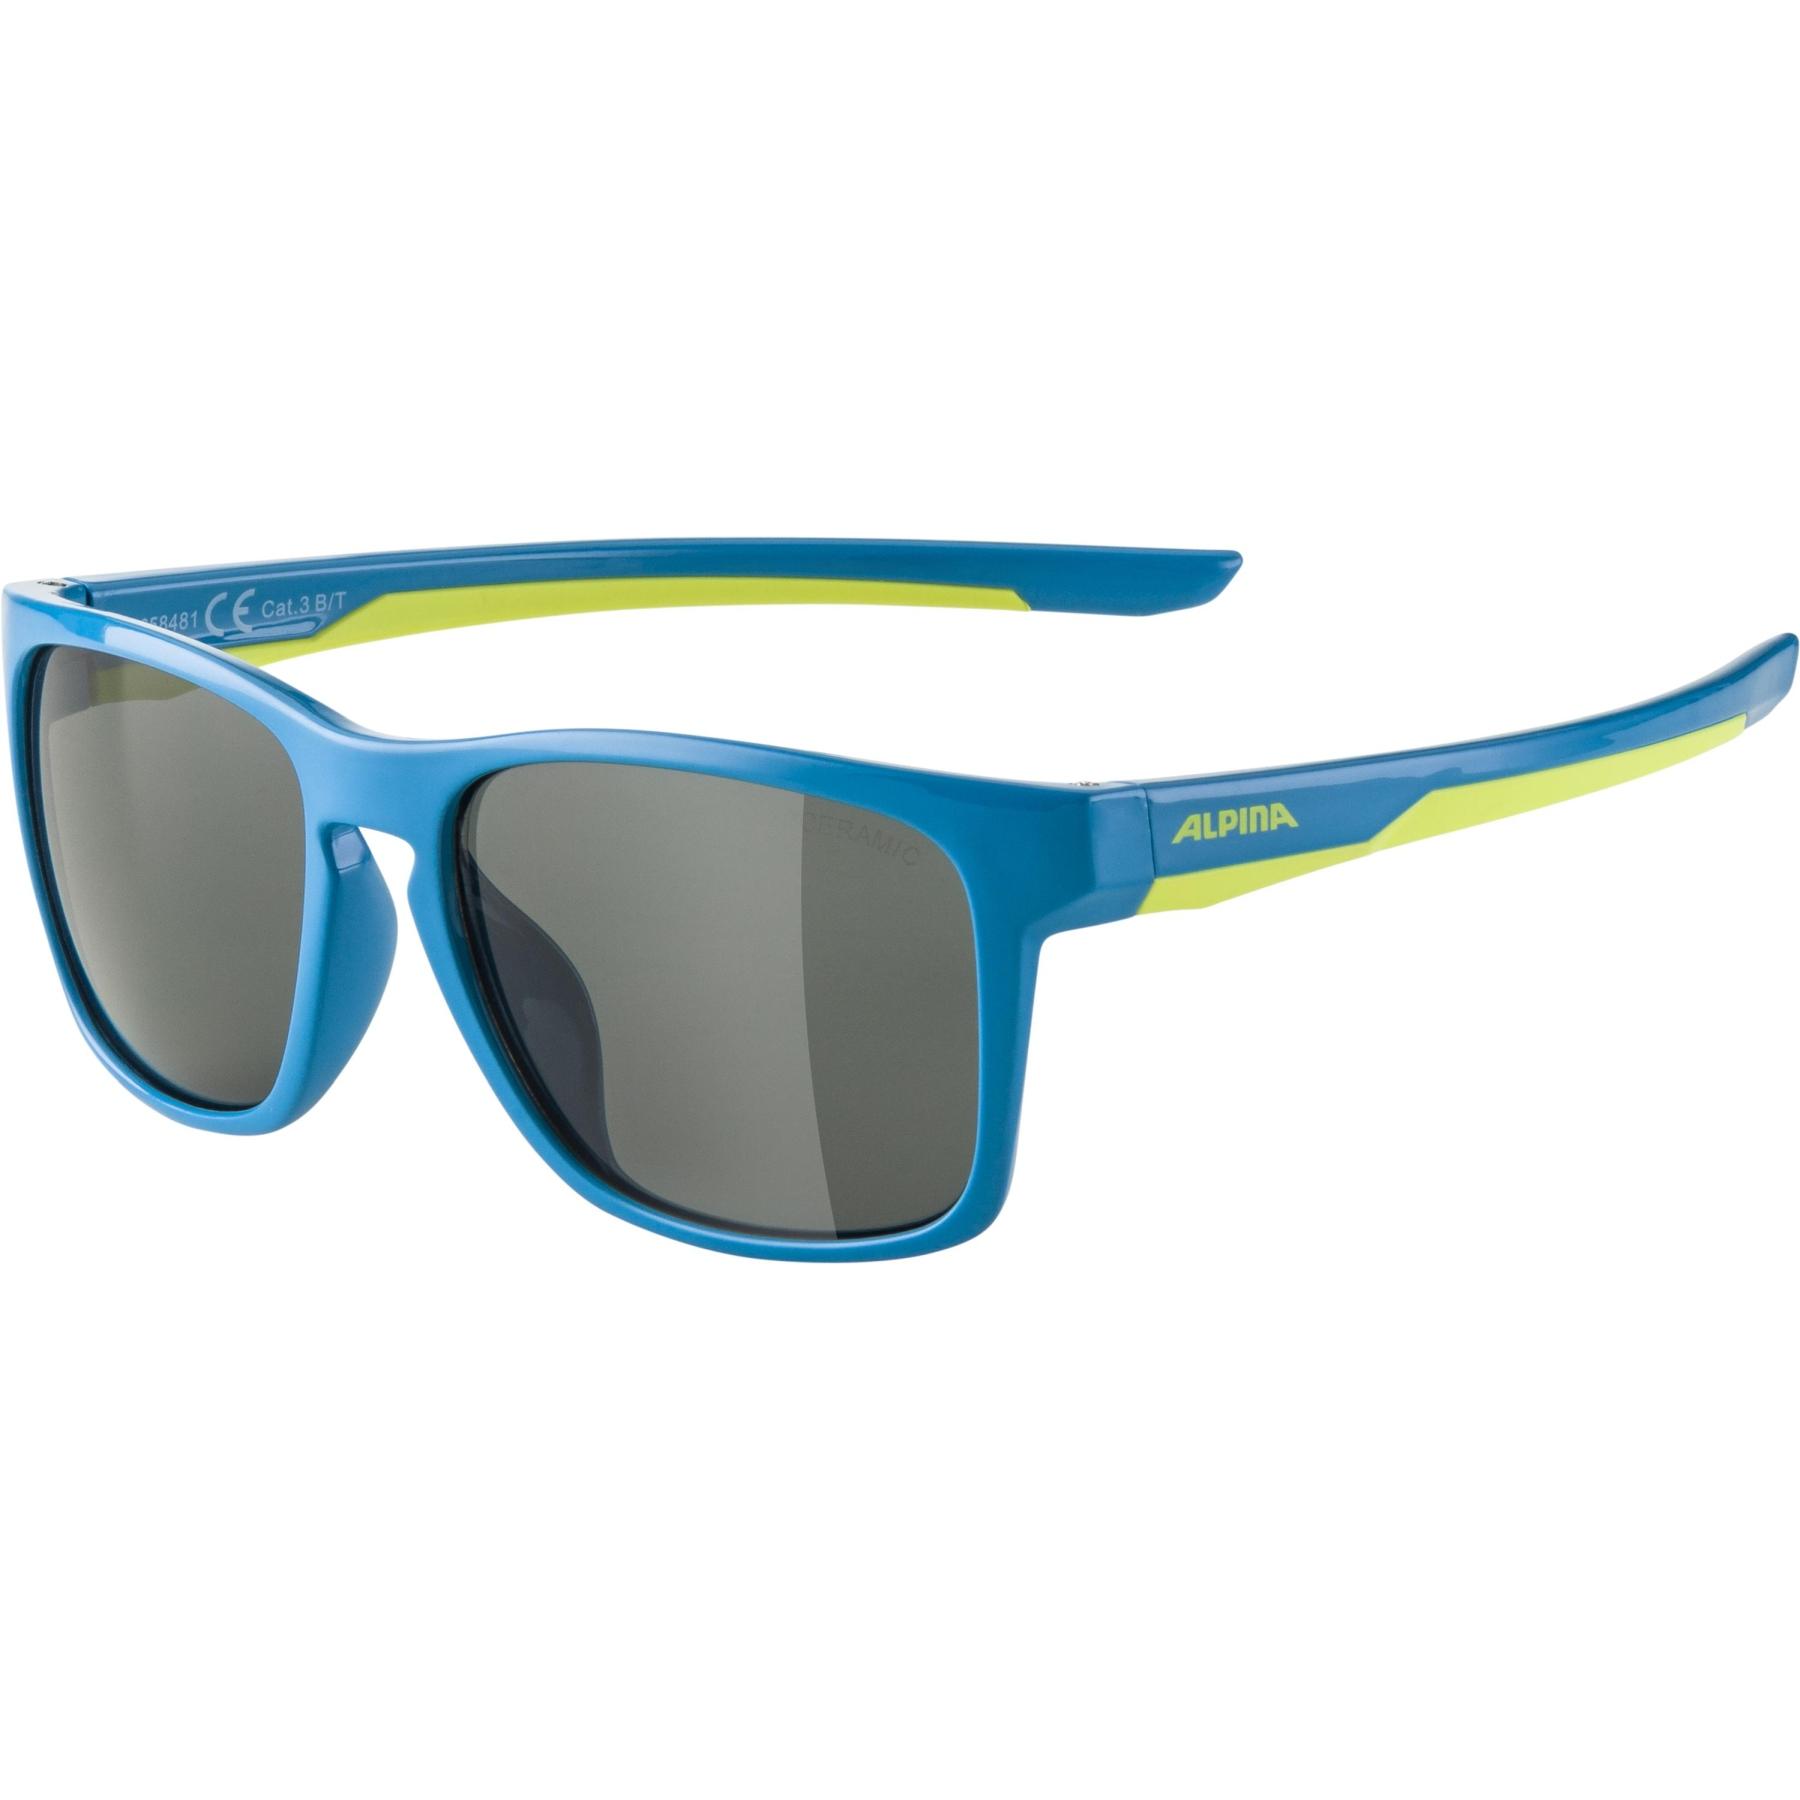 Alpina Flexxy Cool Kids I Glasses - blue-lime / black